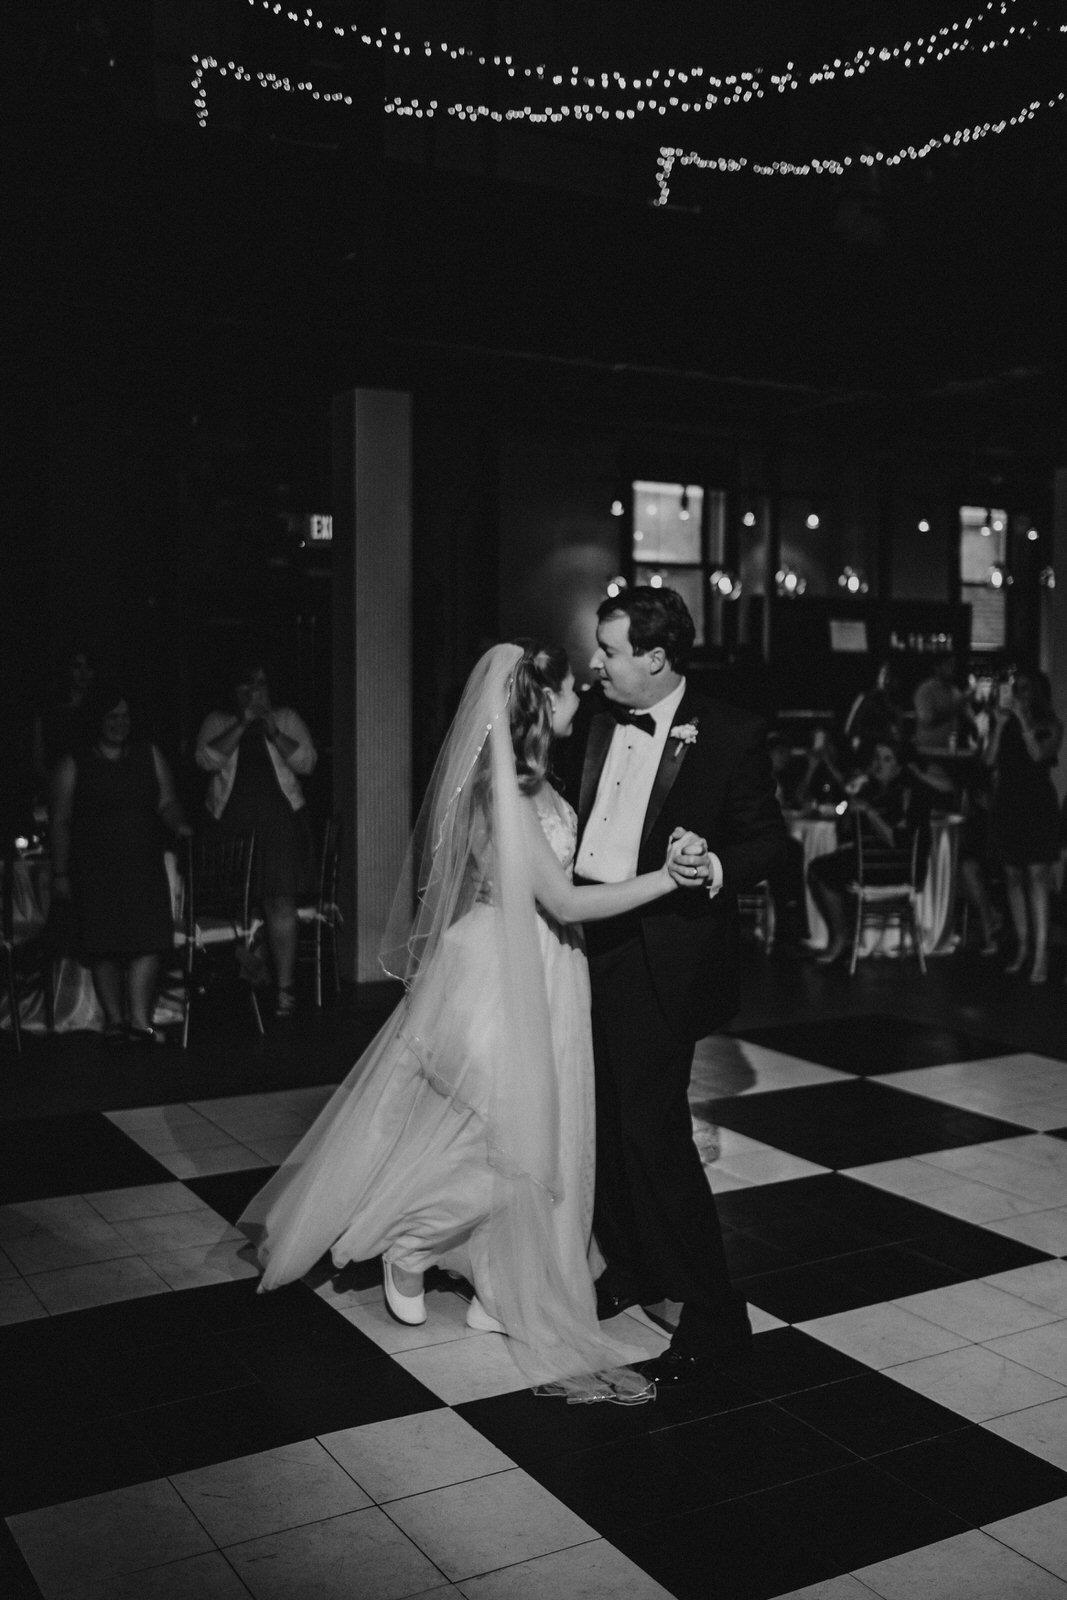 Oxford_Mississippi_wedding_photographer_32.JPG